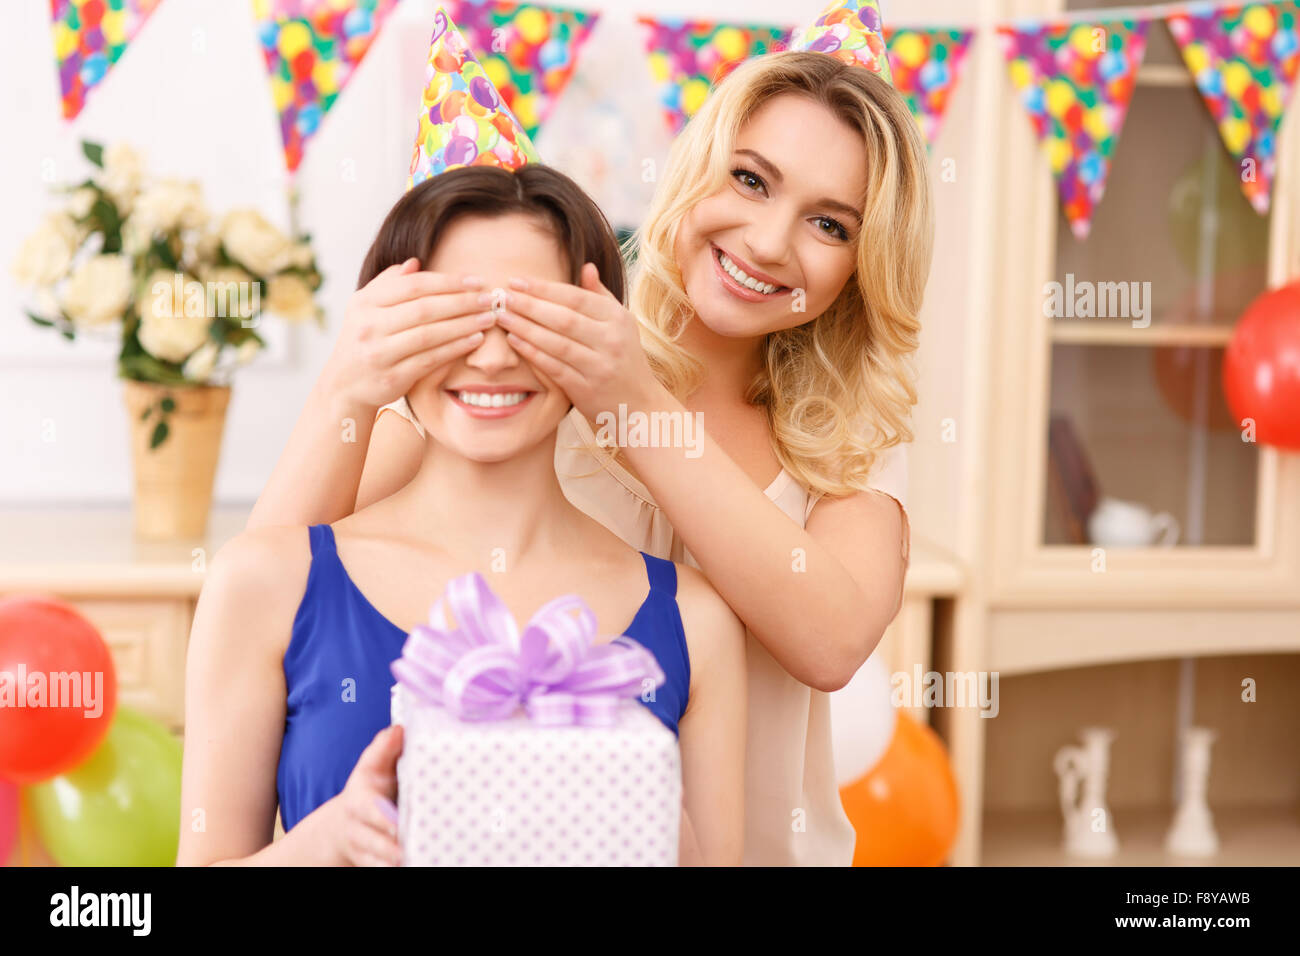 Girls having fun during birthday celebration. - Stock Image